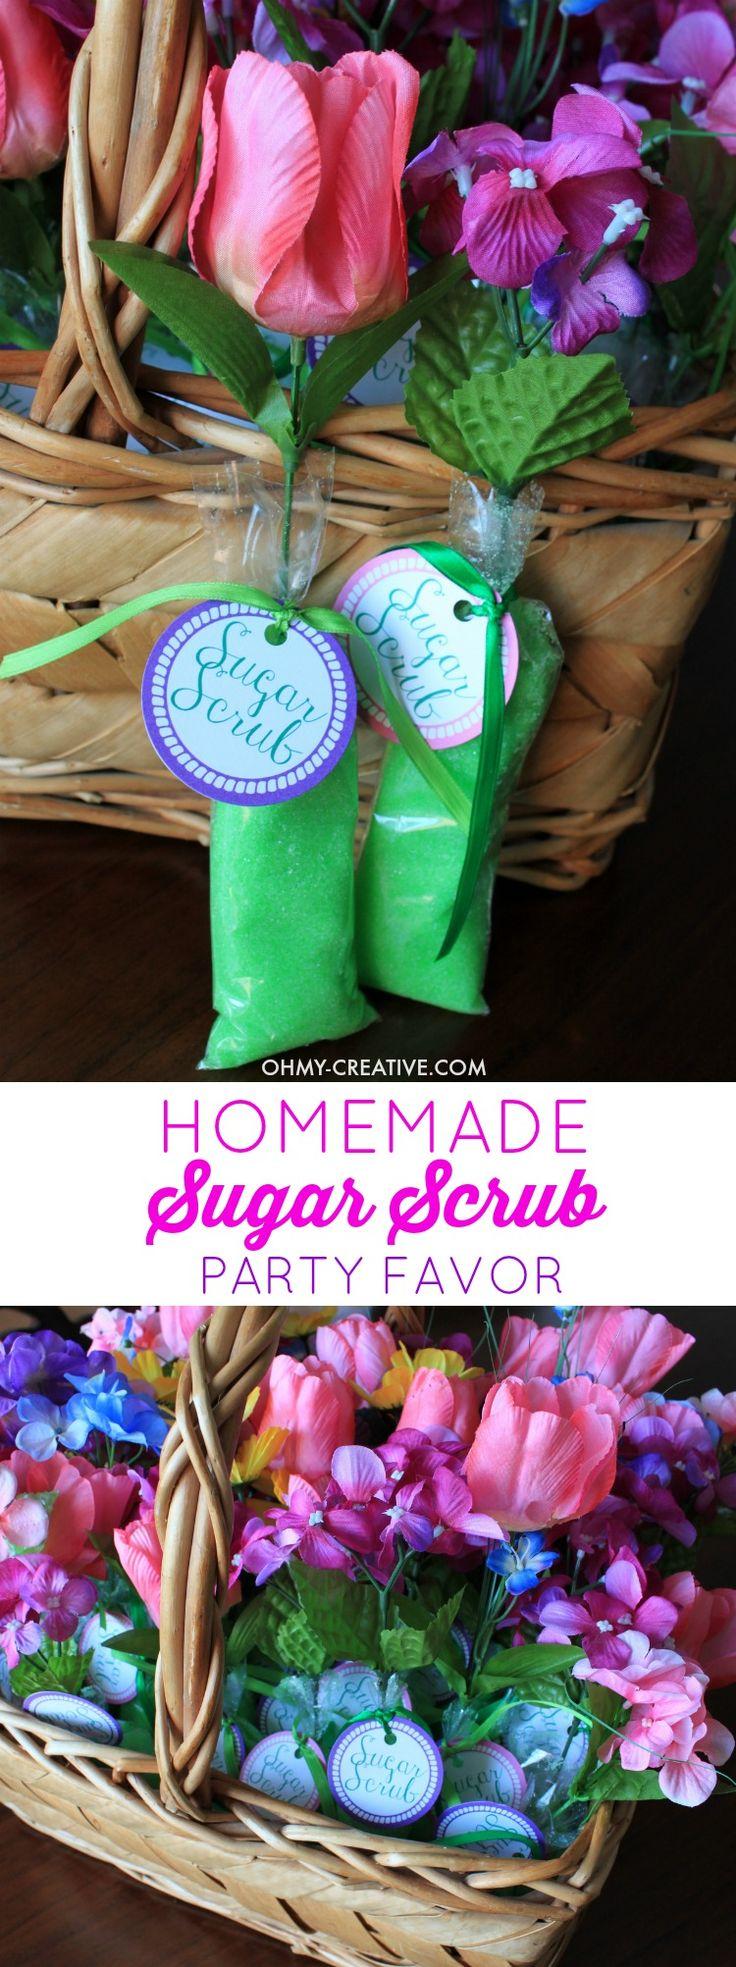 Homemade Sugar Scrub Shower Favors 785 best